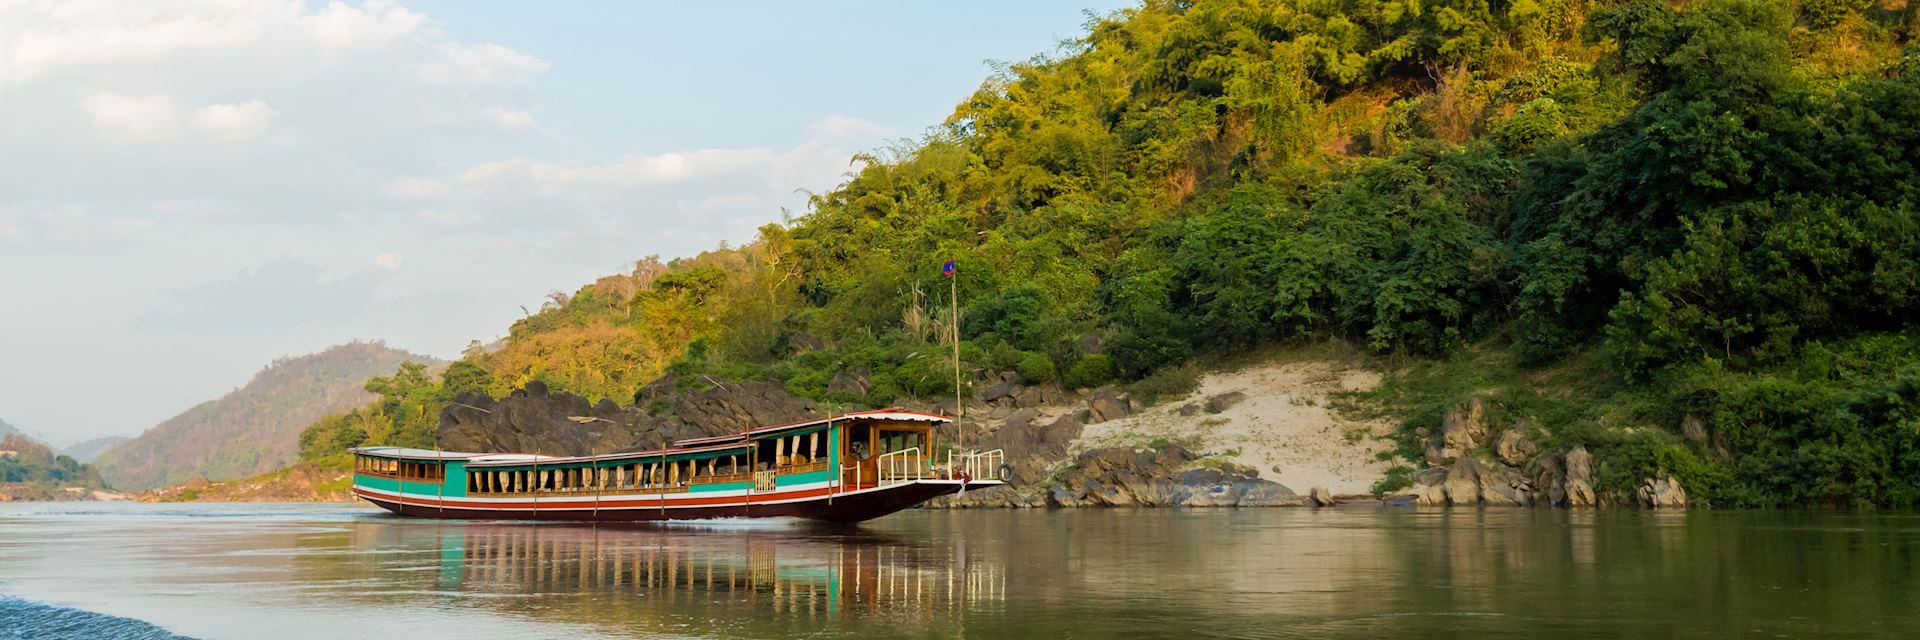 Mekong near Pakbeng